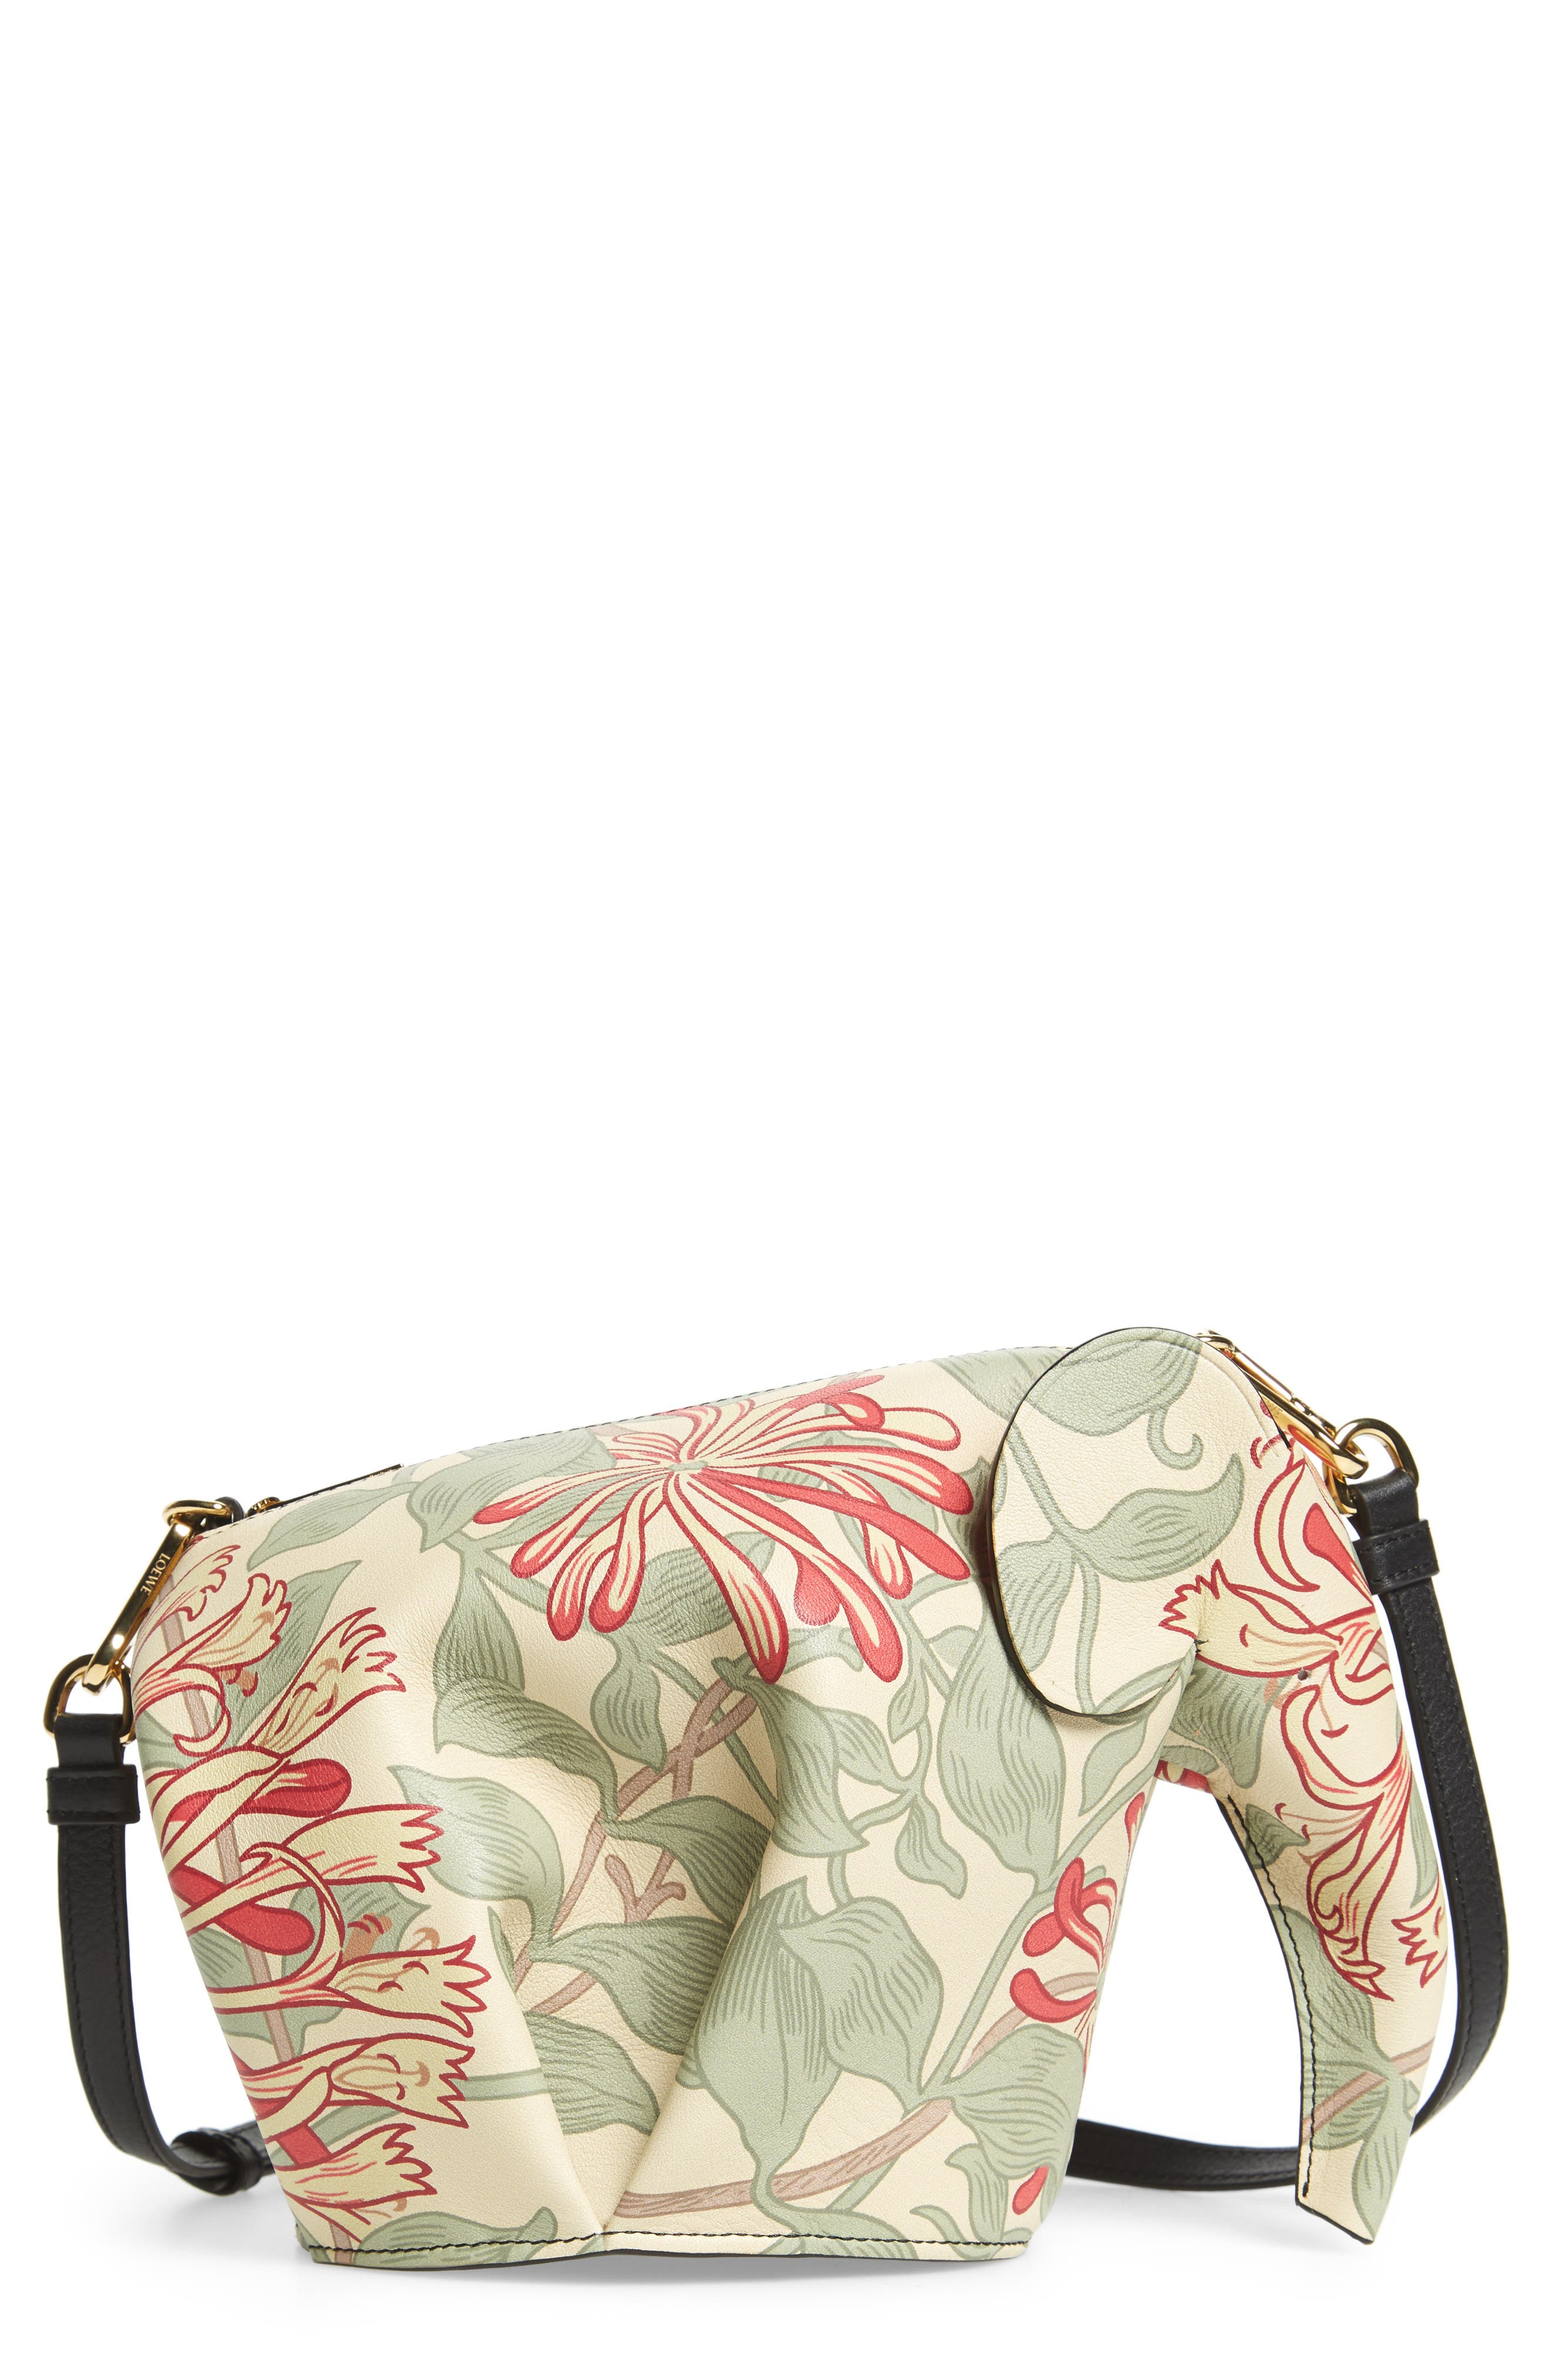 Mini Elephant Honeysuckle Print Leather Crossbody Bag,                             Main thumbnail 1, color,                             Beige/ Green/ Multicolour